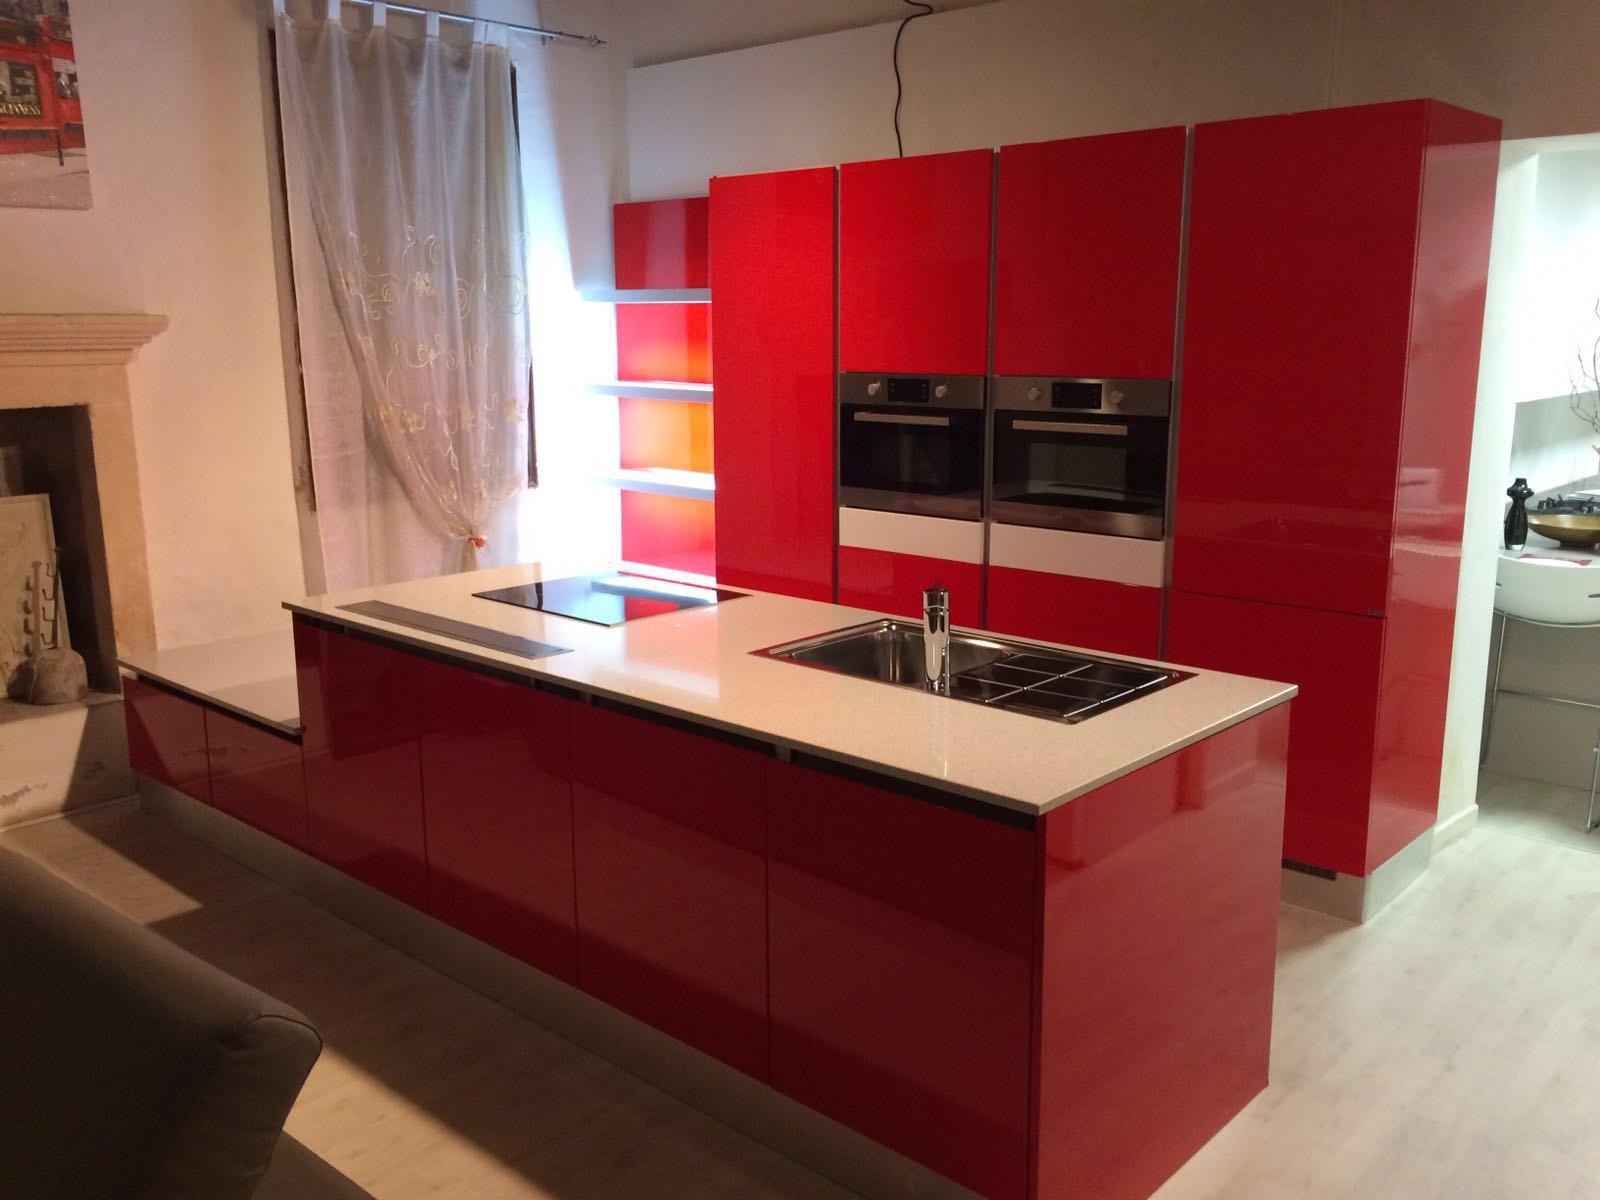 Cucina Maior Cucine Geo Moderno Laccato Lucido Rossa - Cucine a ...